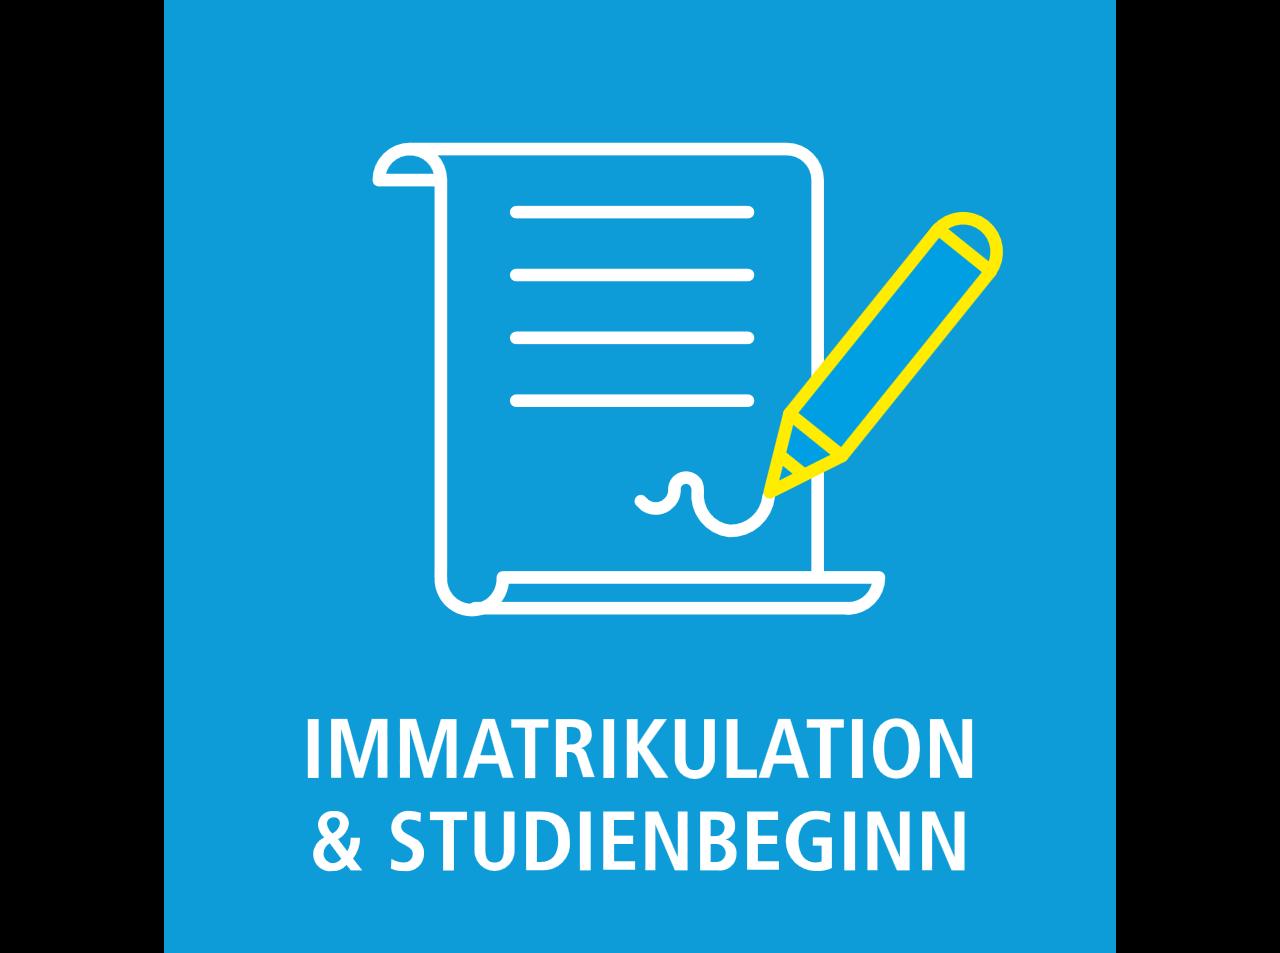 Immatrikulation & Studienbeginn